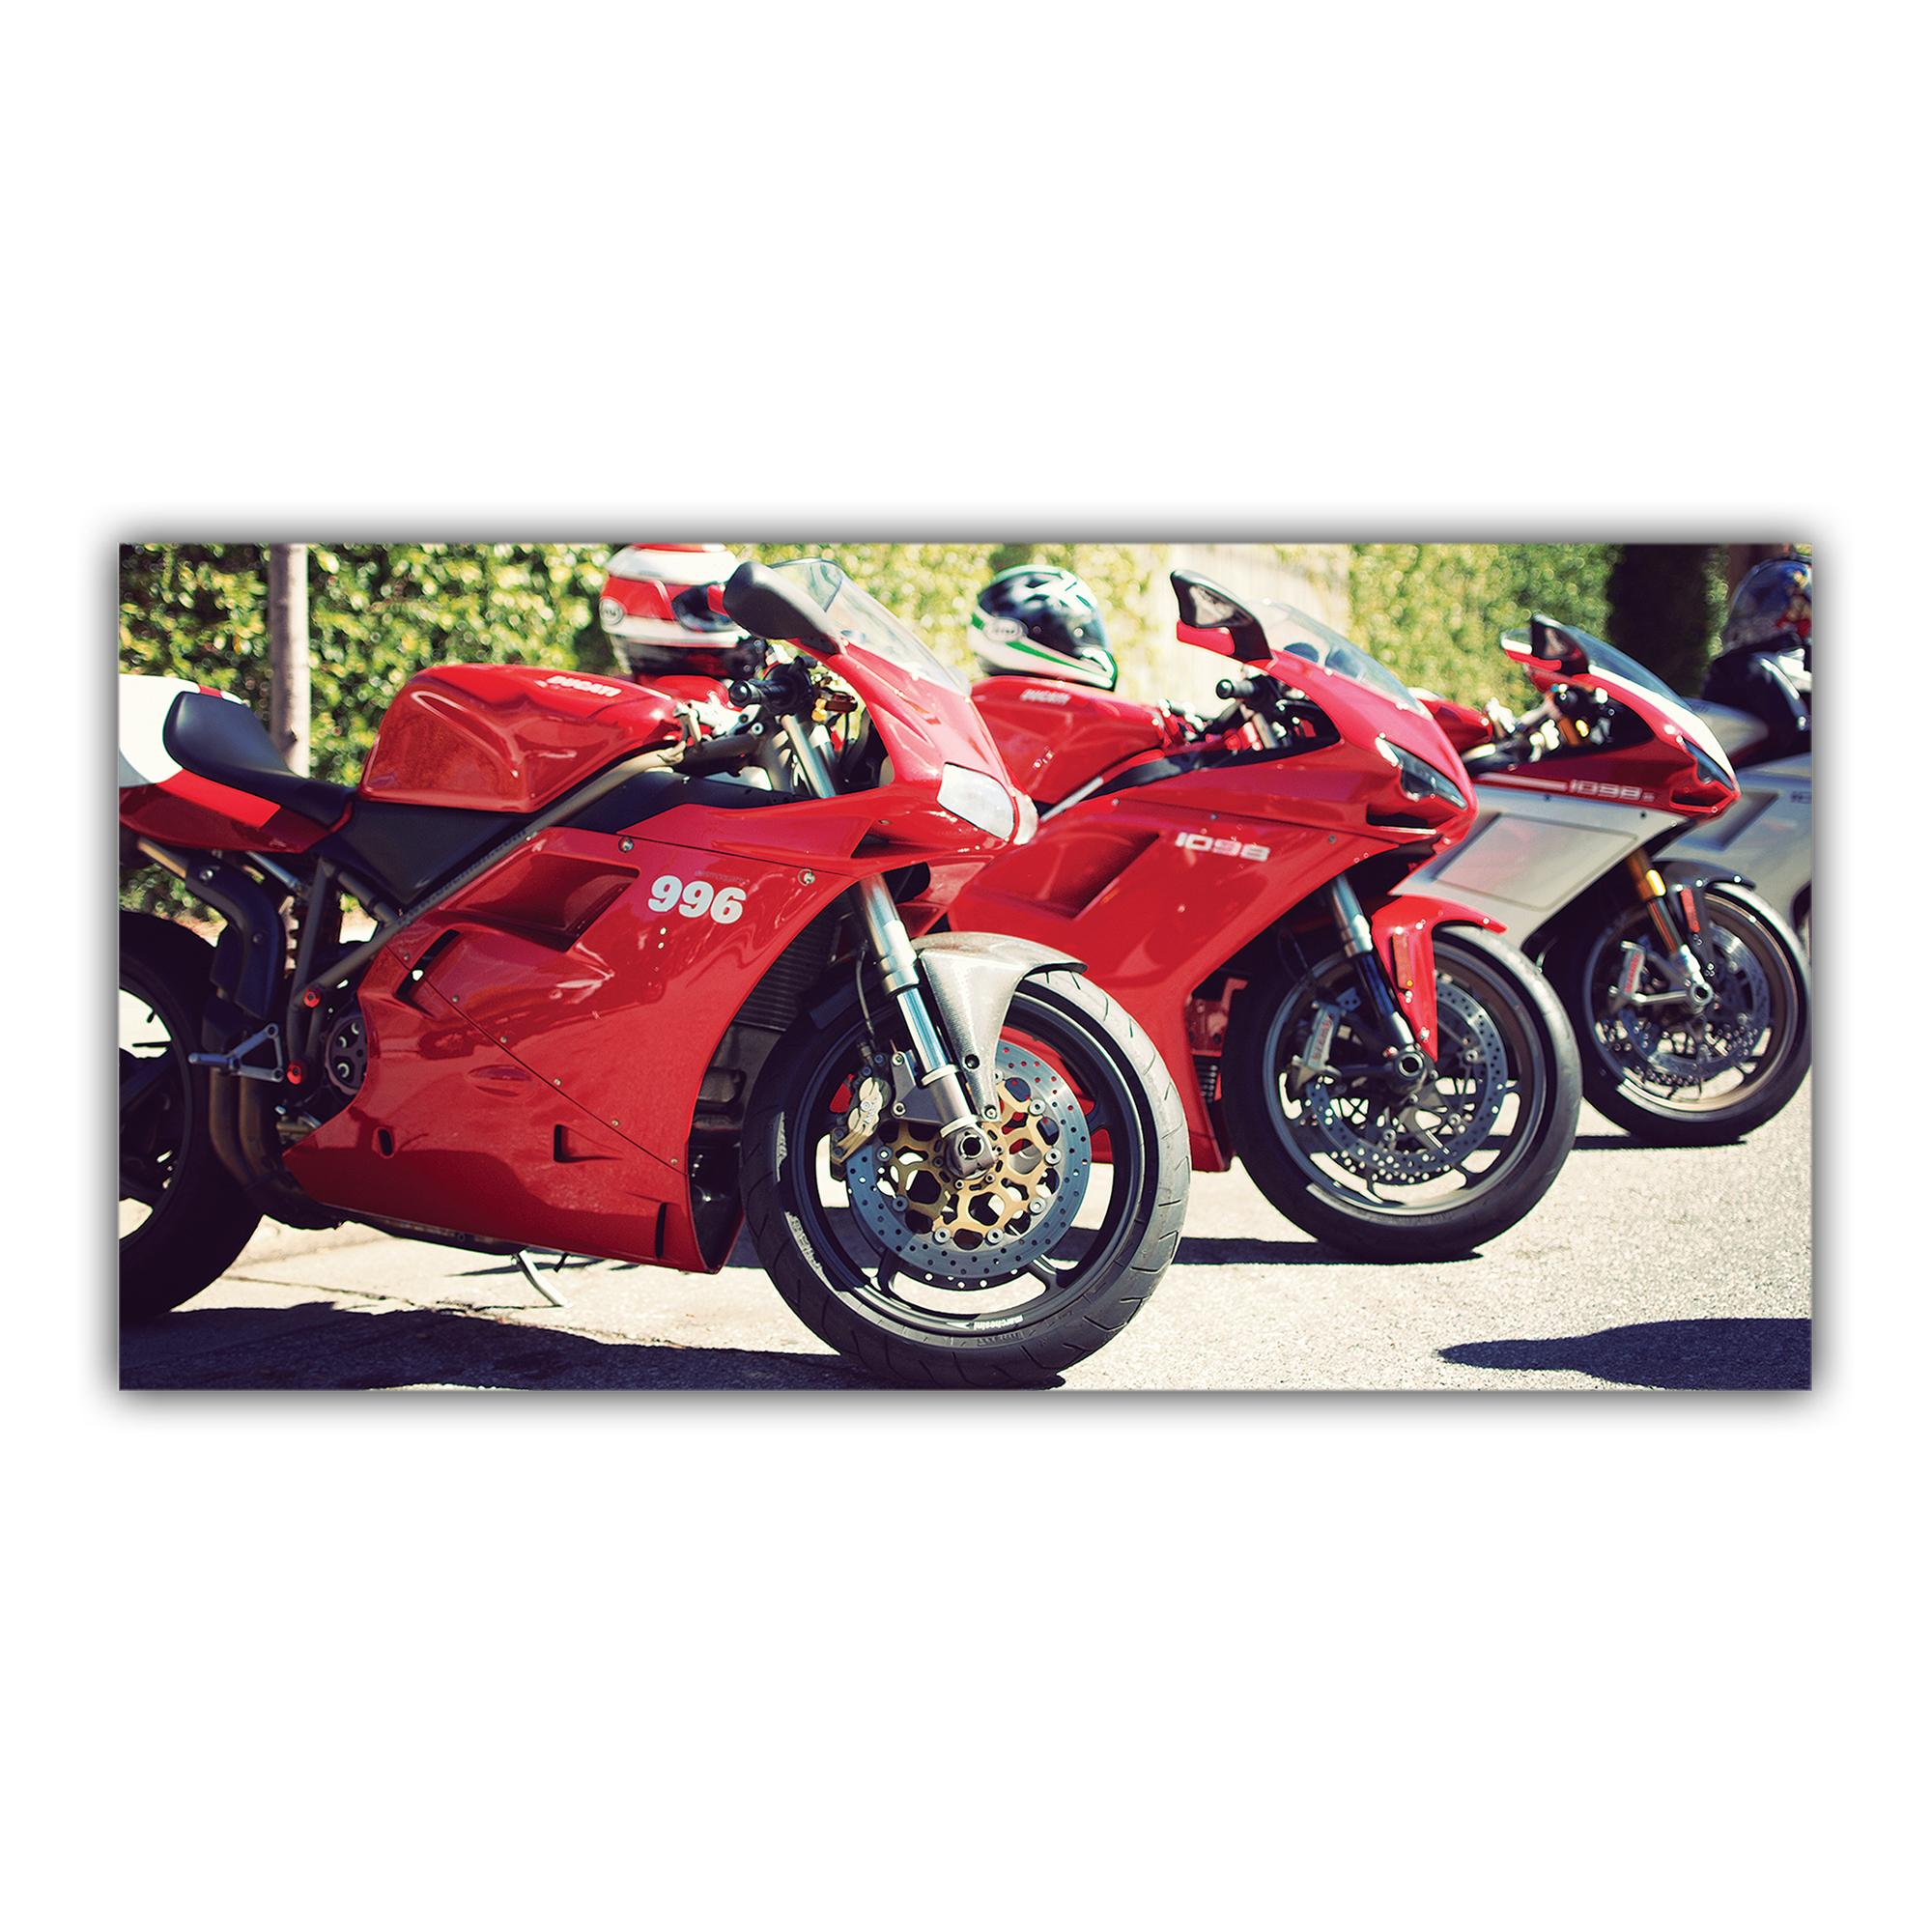 Ducati Sportbike 996 1098